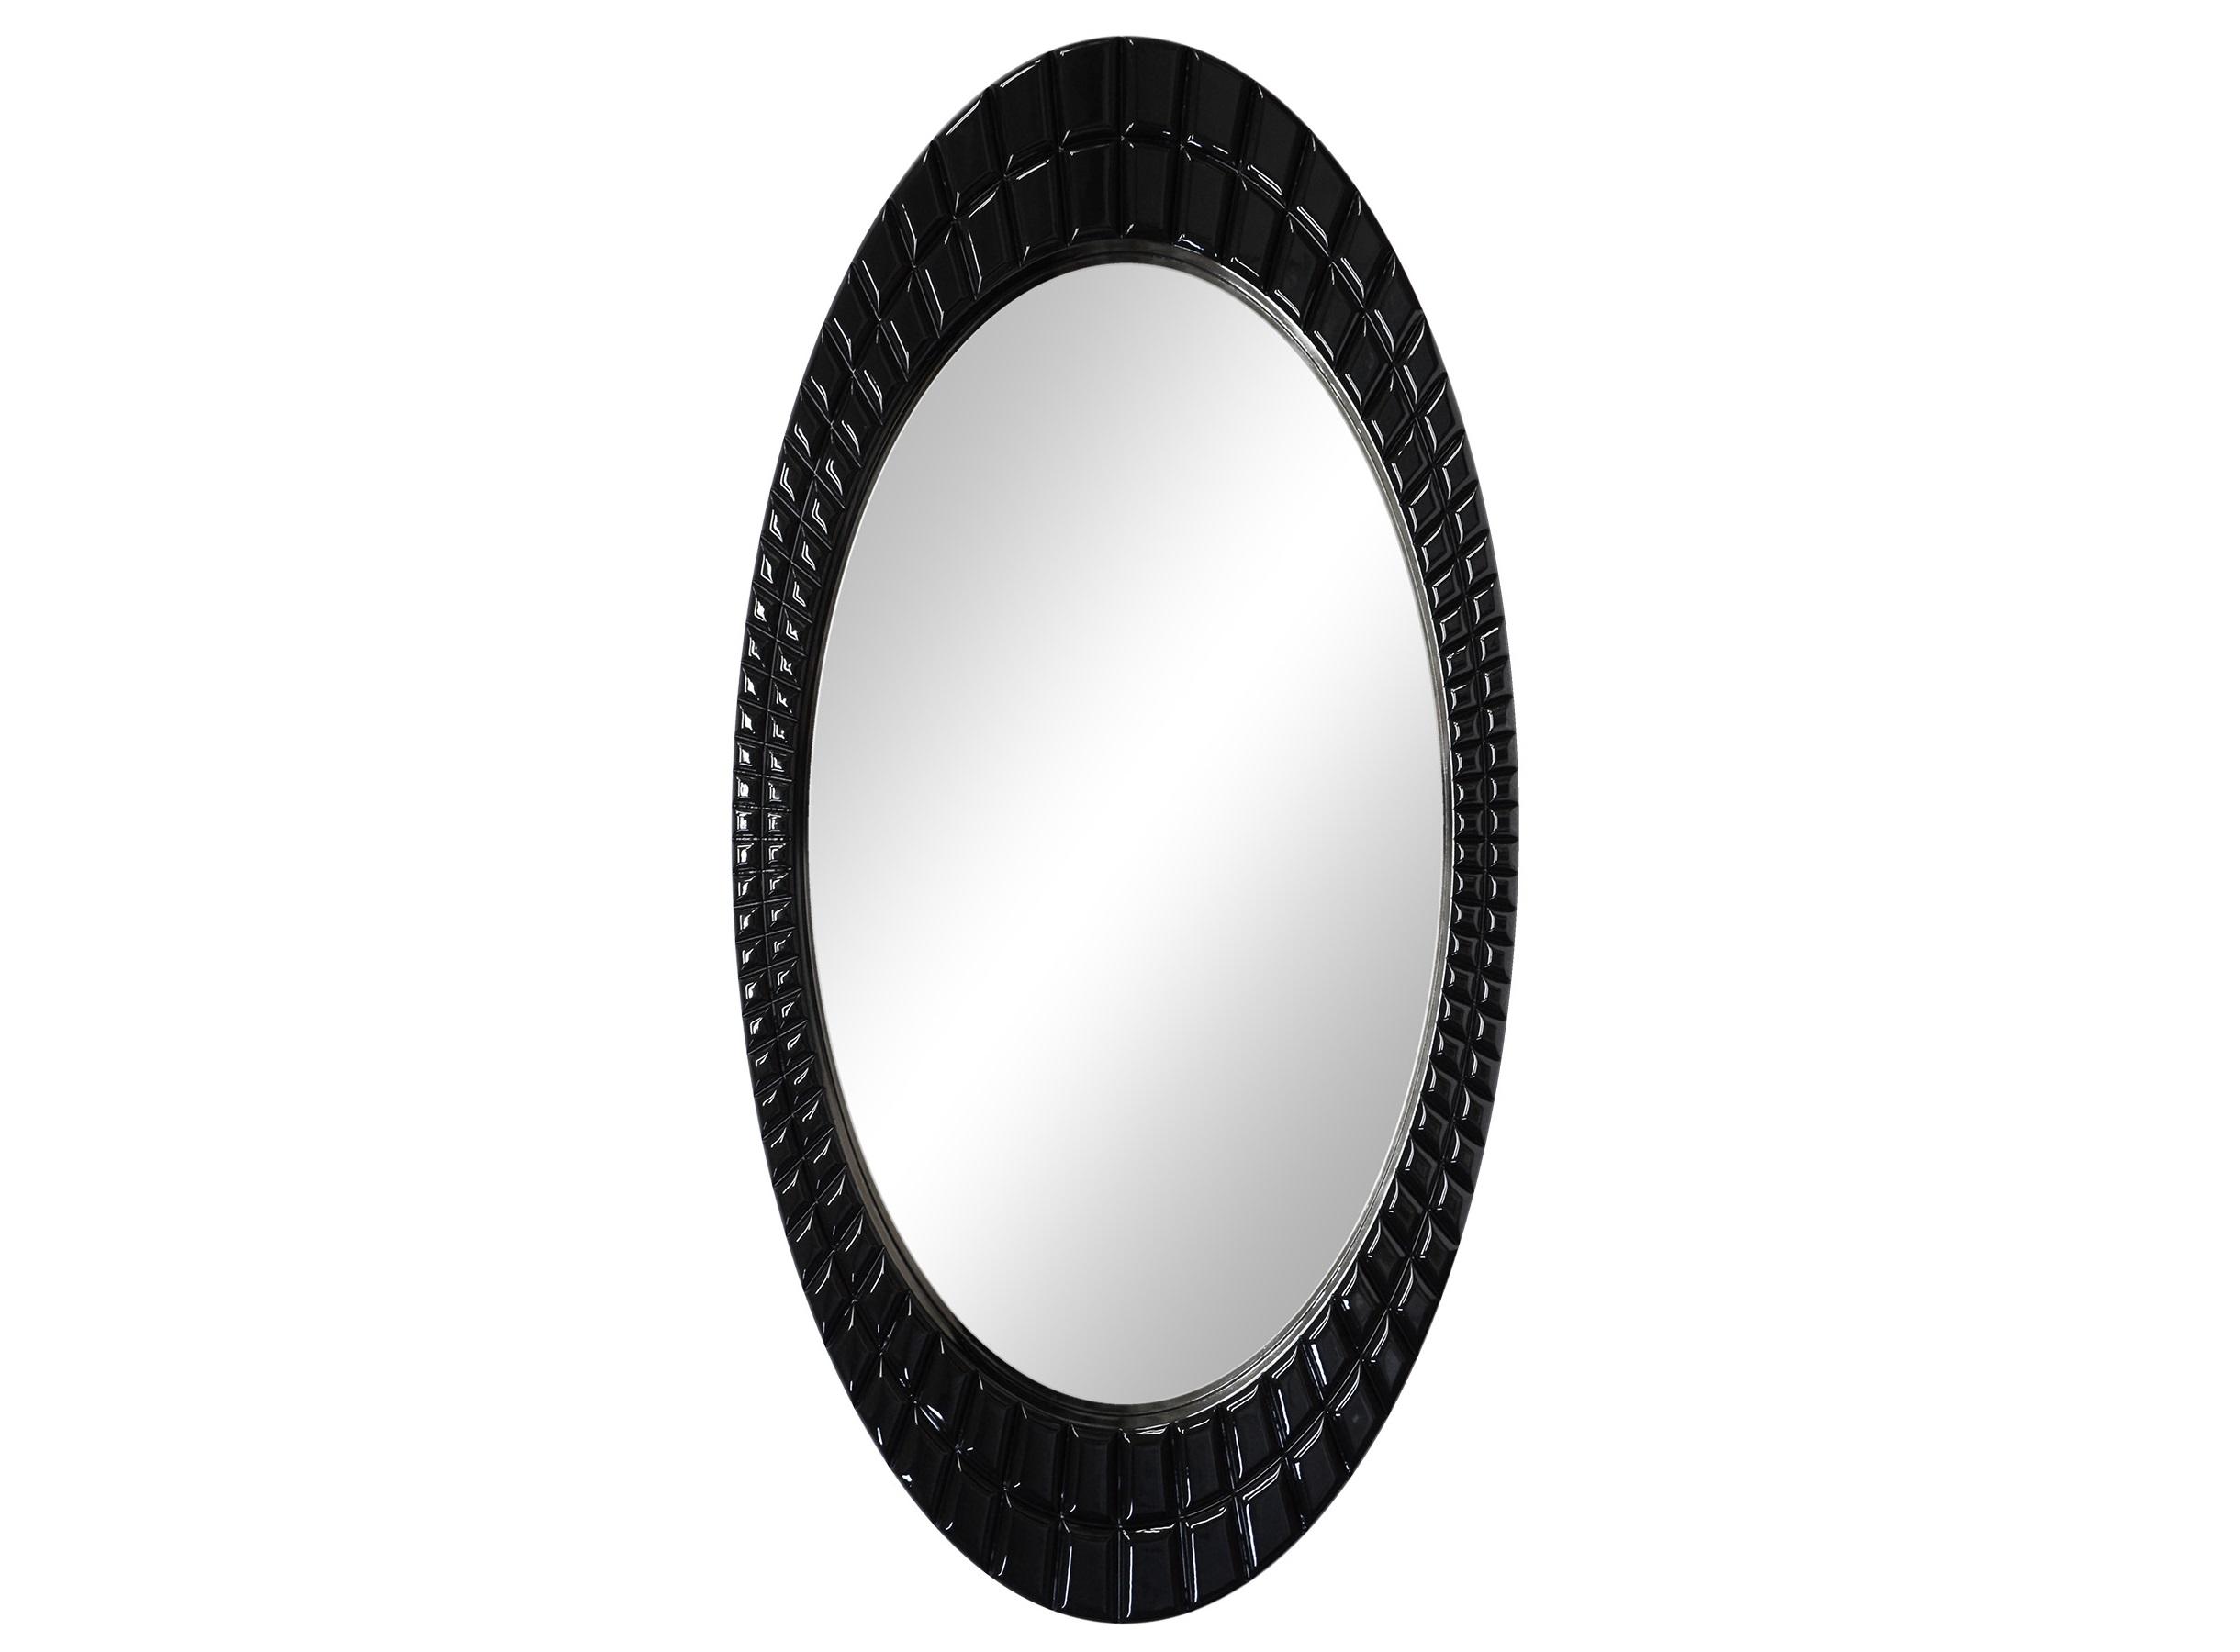 Зеркало ВеццоНастенные зеркала<br><br><br>Material: Стекло<br>Length см: None<br>Width см: 60<br>Depth см: 4<br>Height см: 120